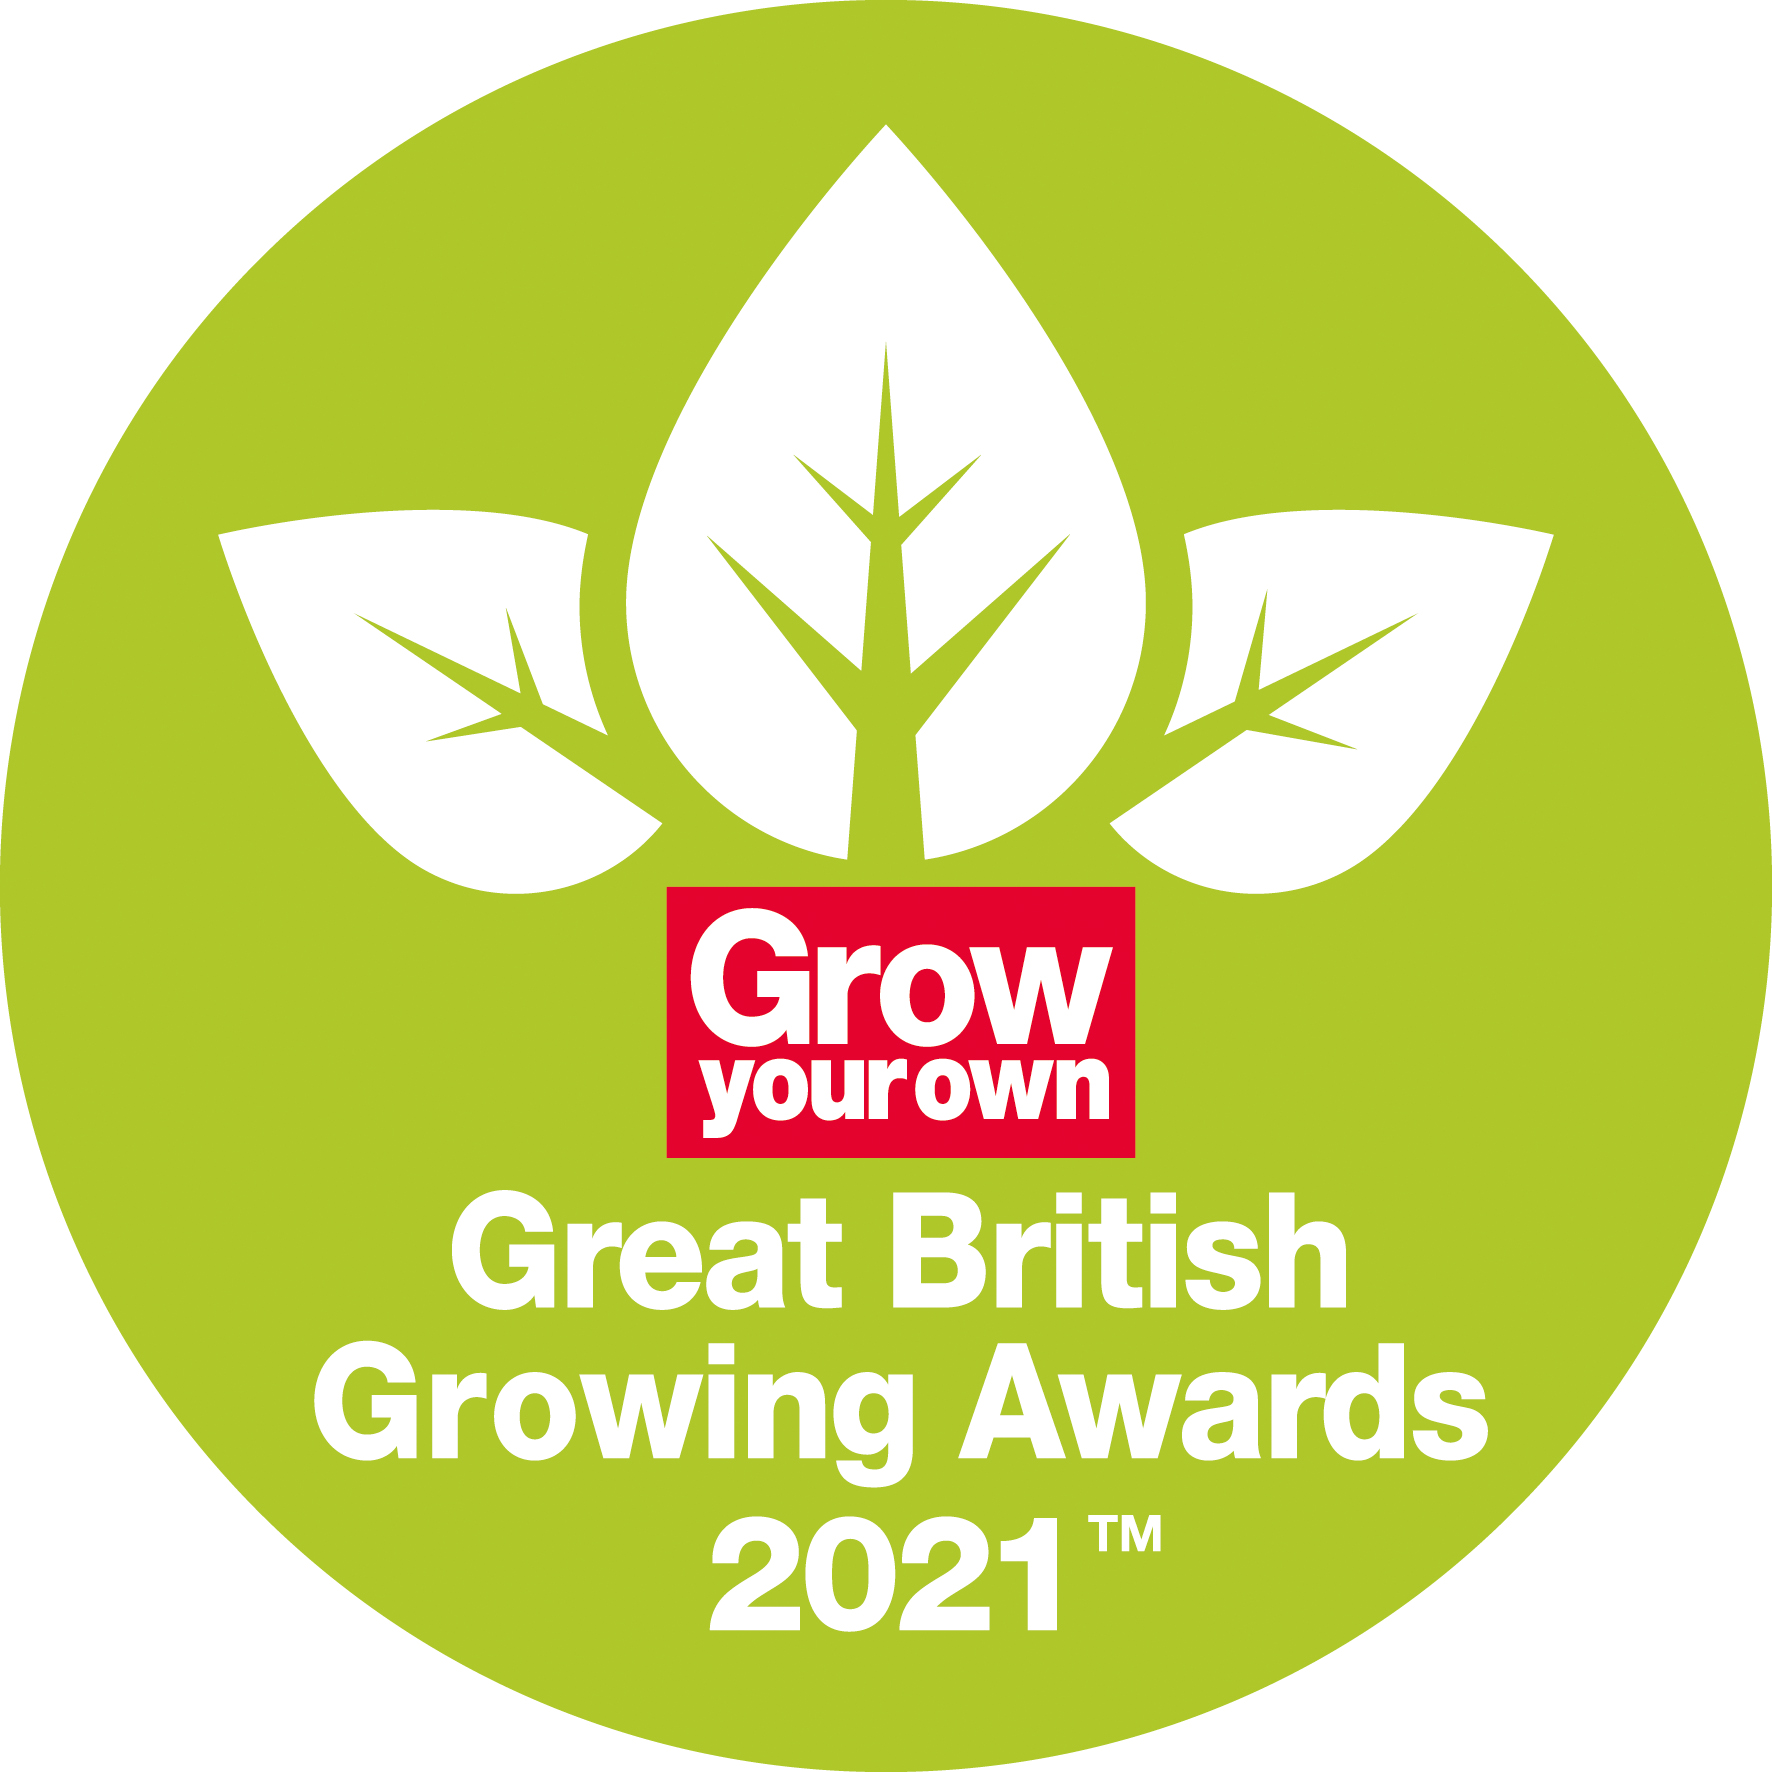 Great British Growing Awards 2021